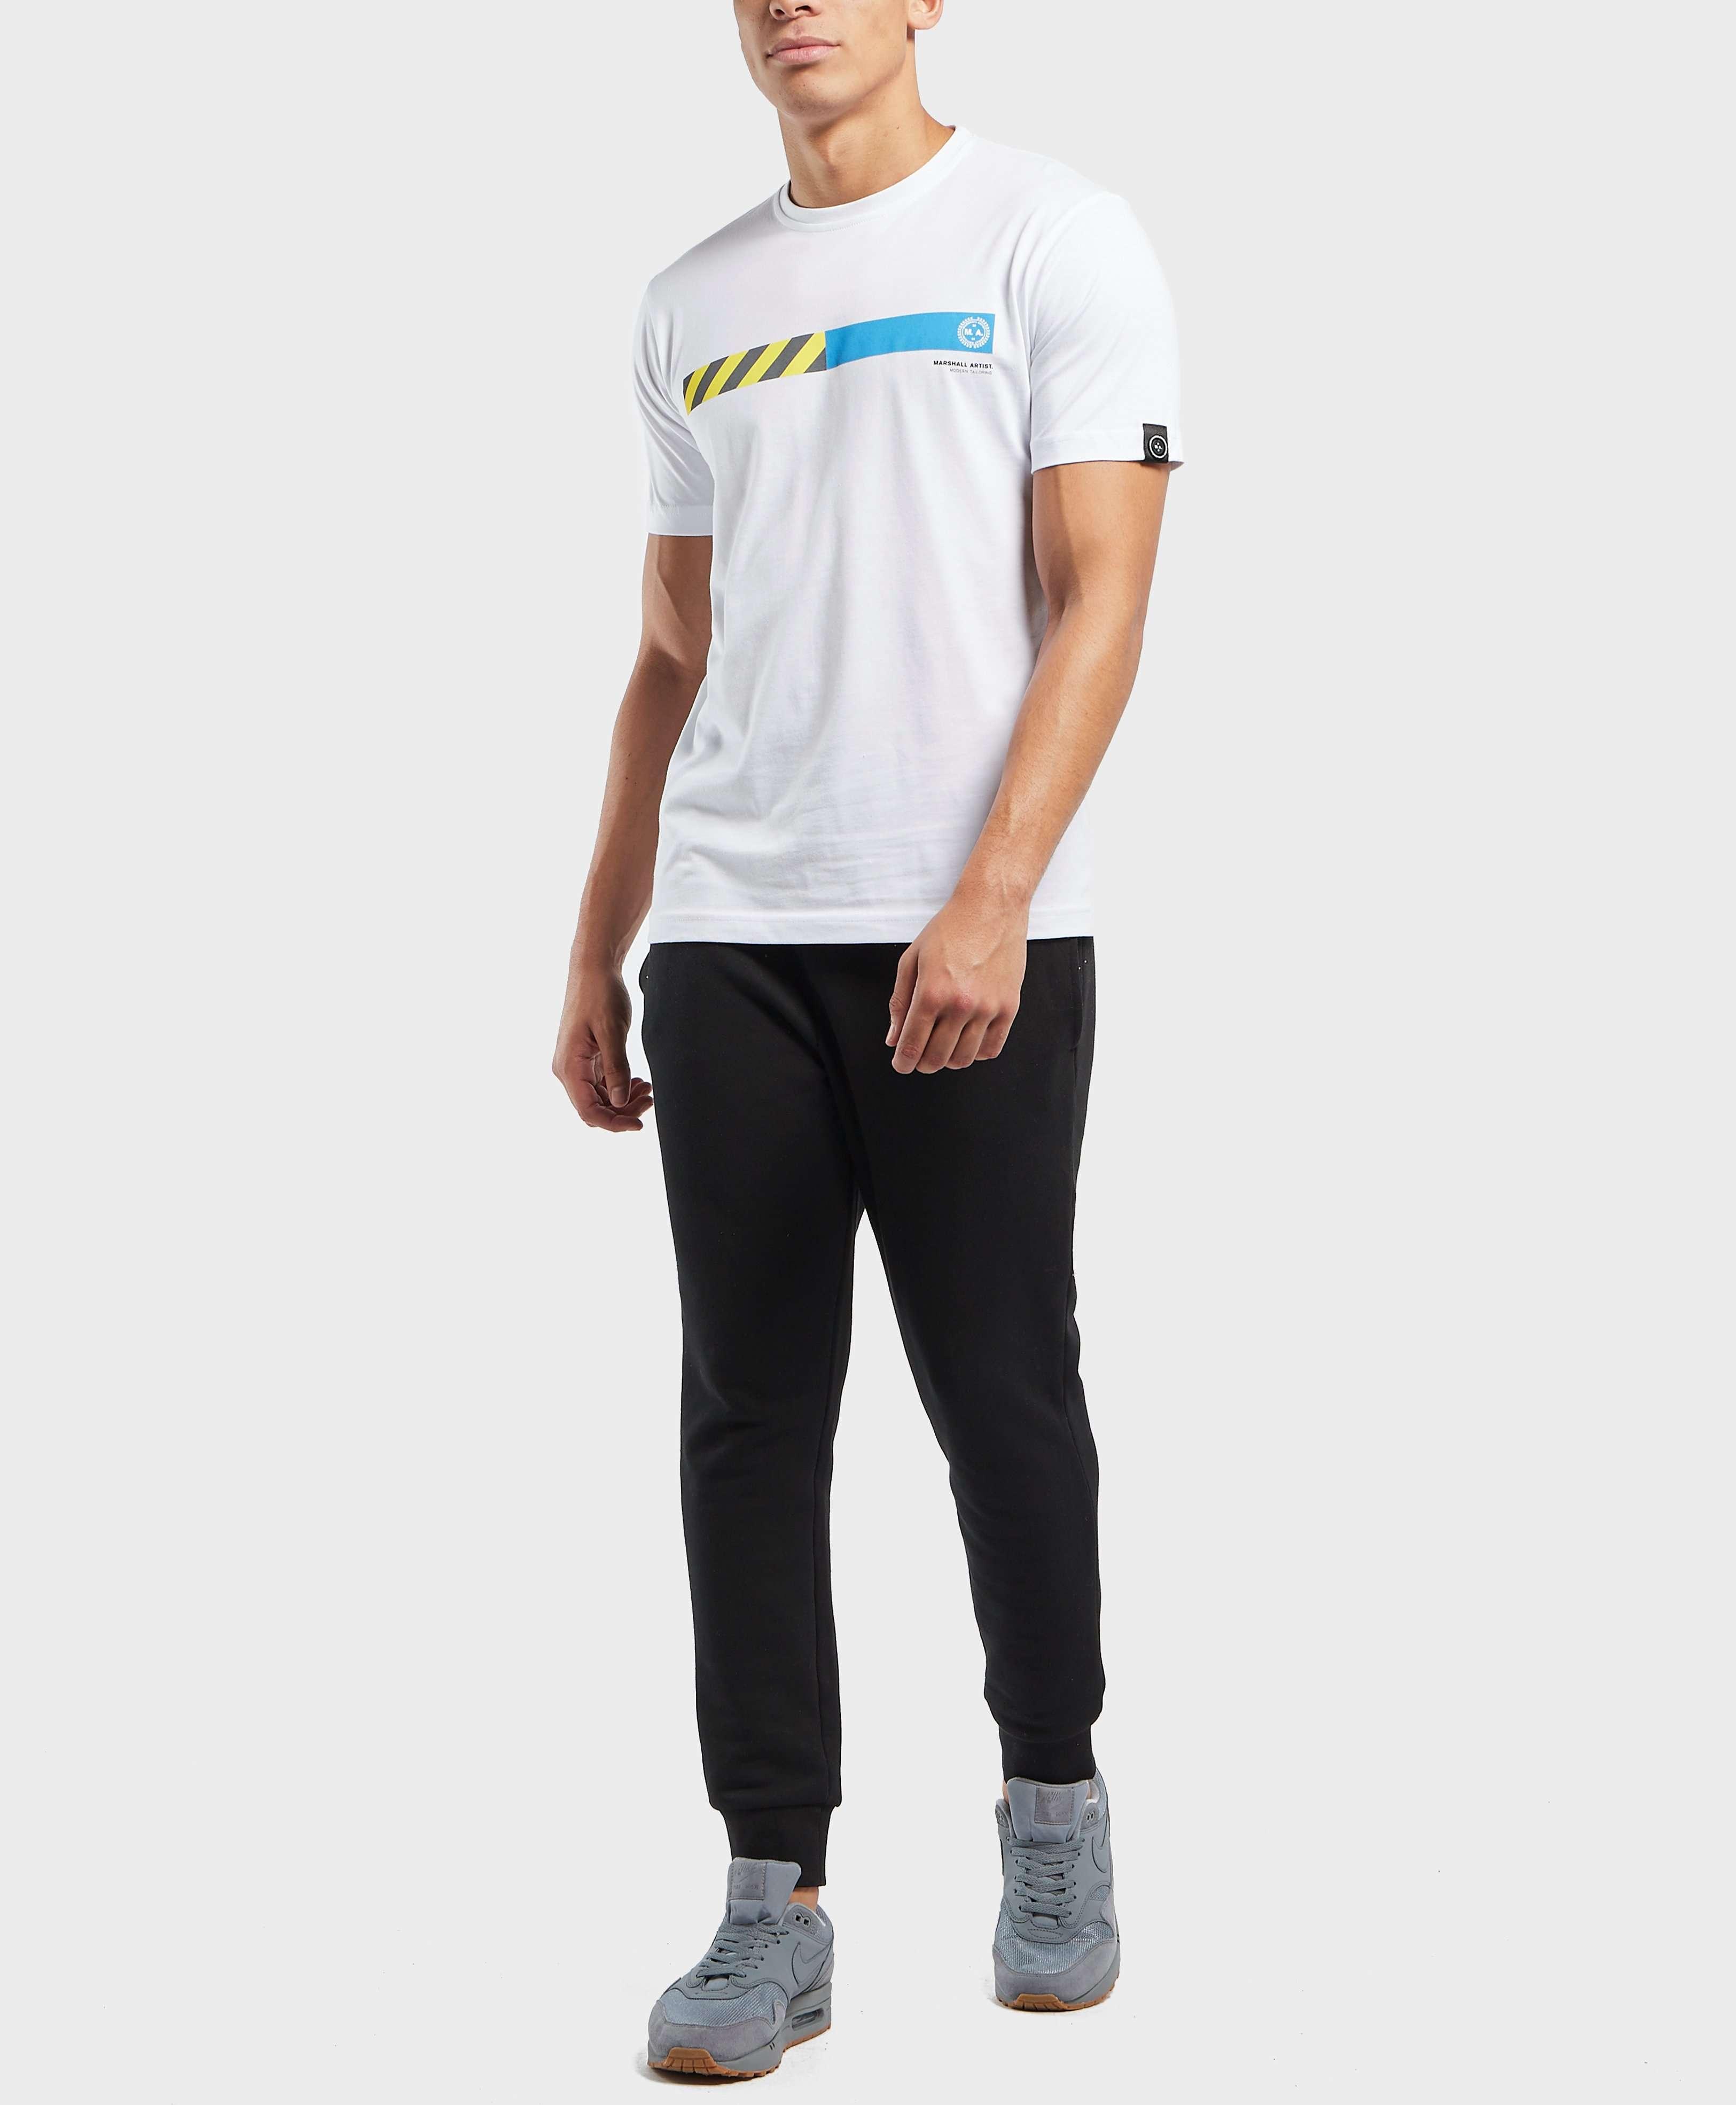 Marshall Artist Hac Logo Short Sleeve T-Shirt